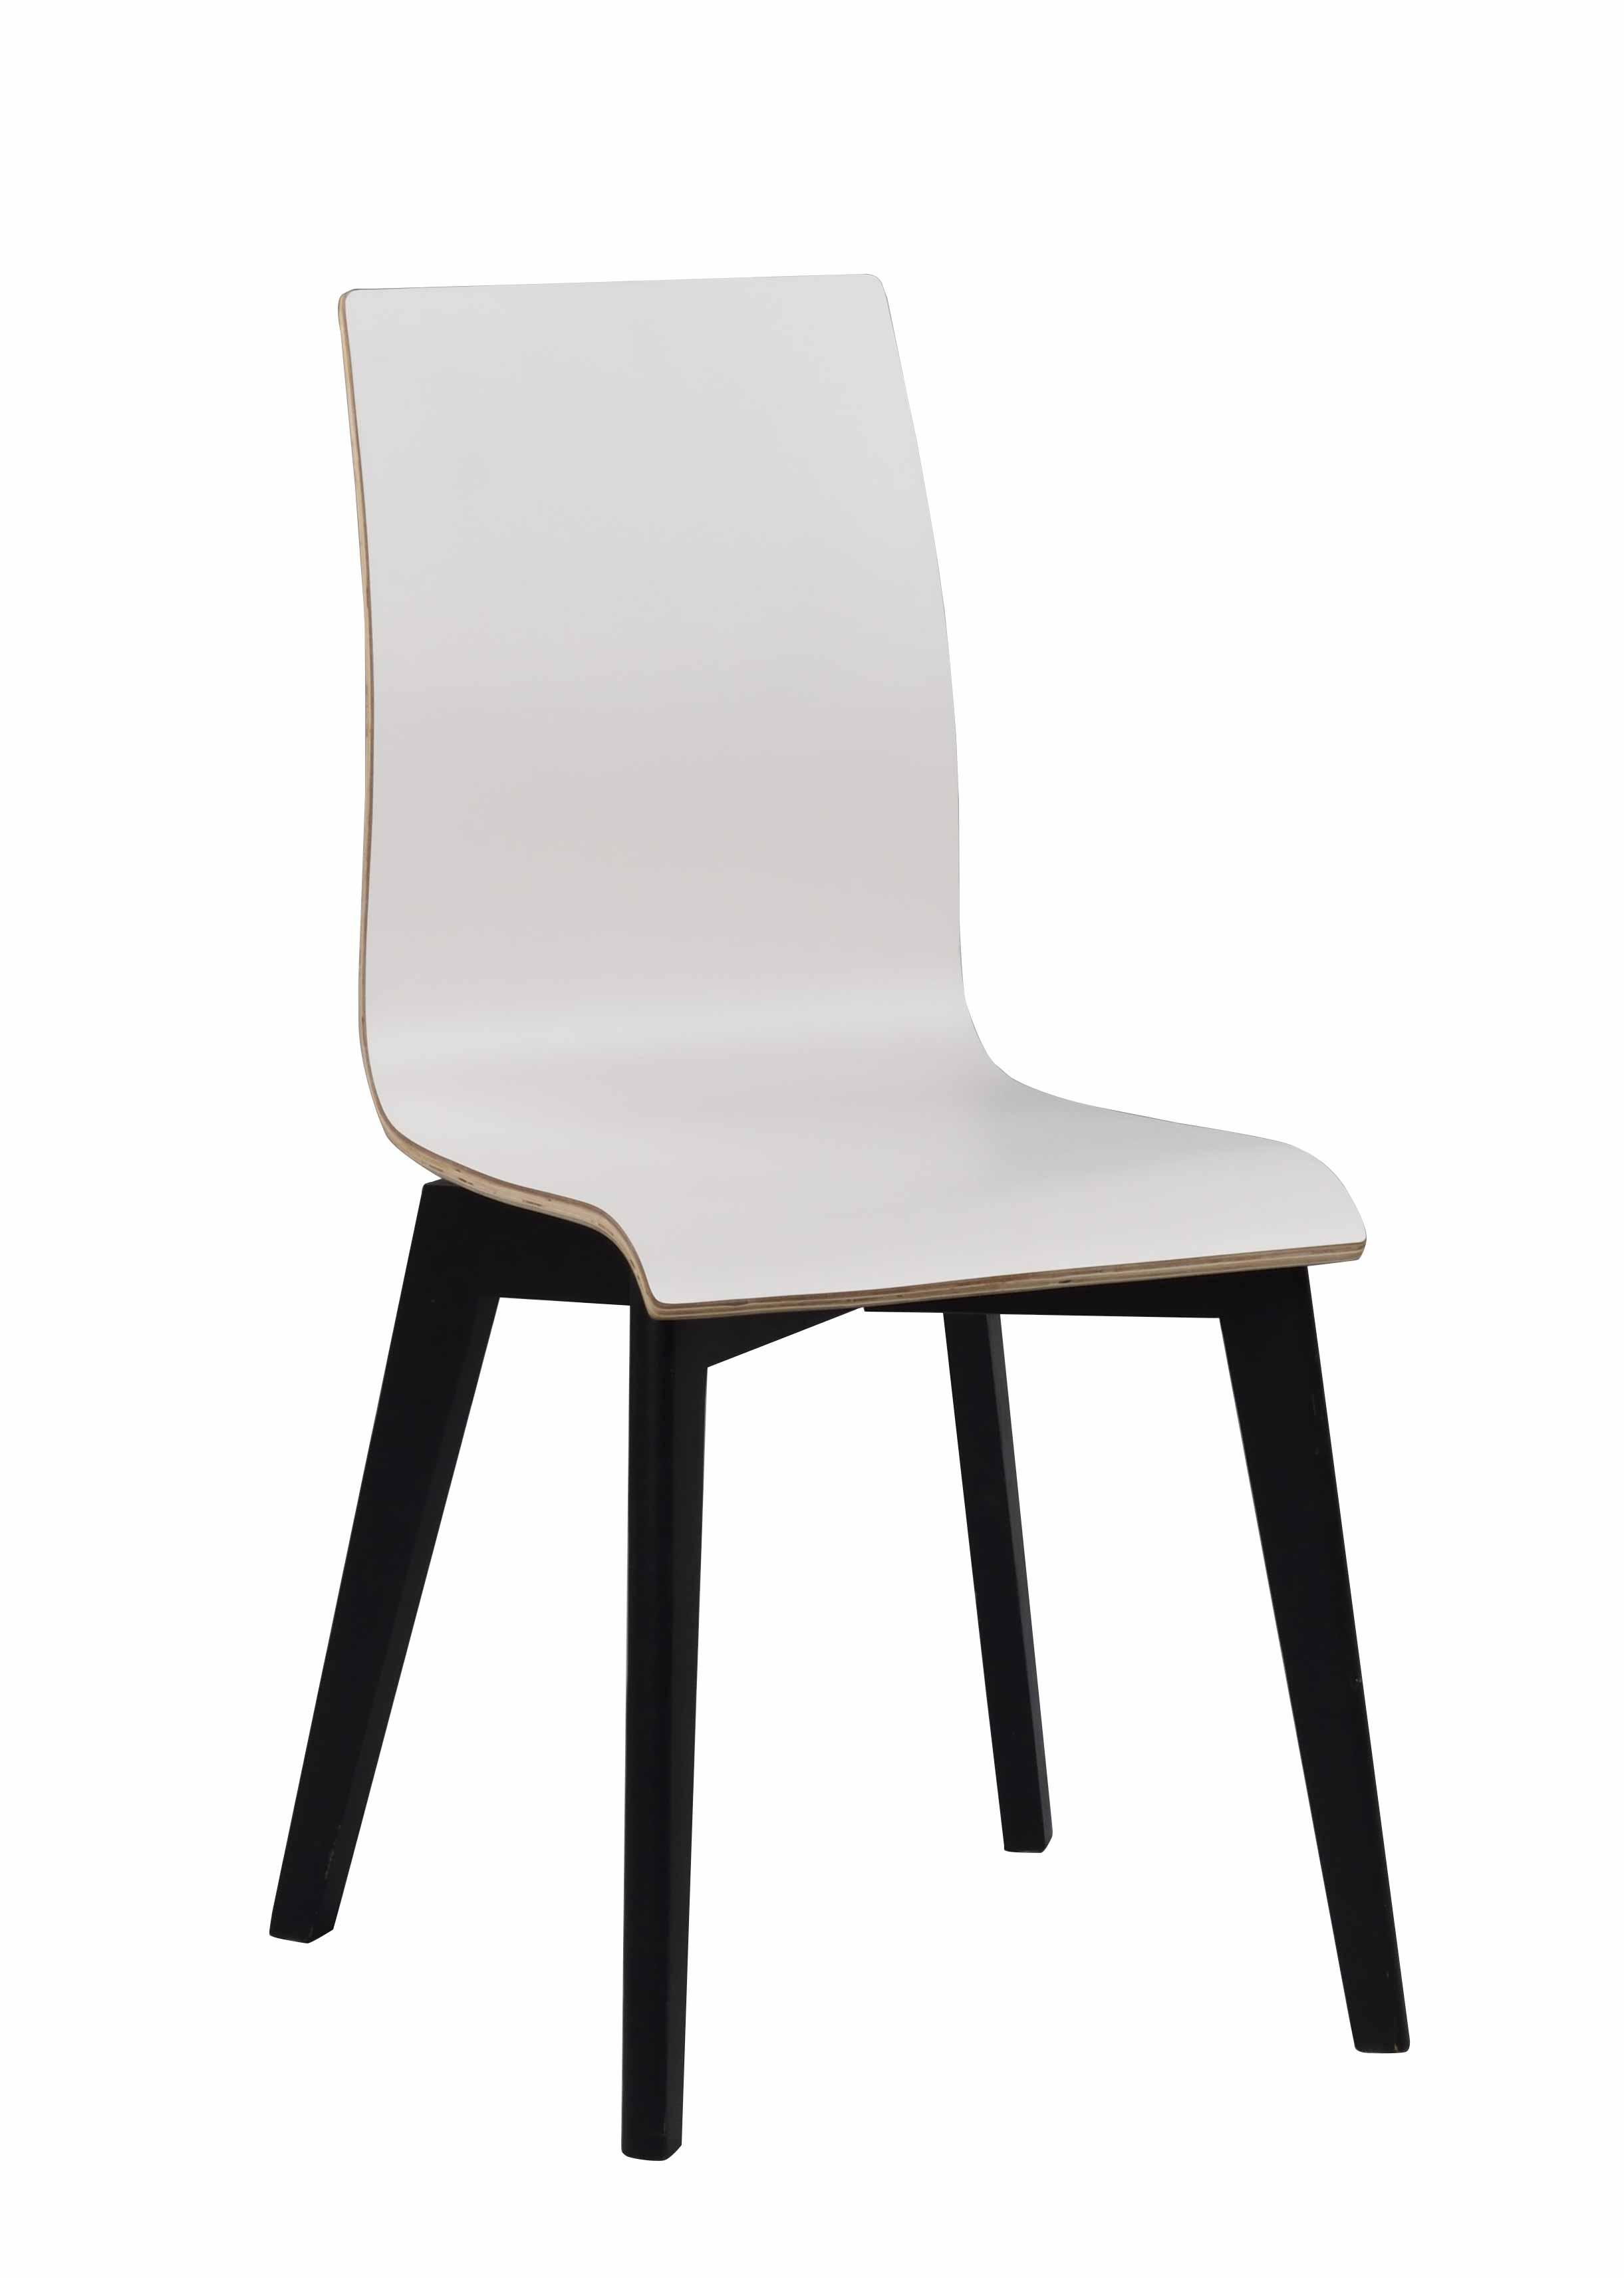 ROWICO Gracy spisebordsstol - hvid laminat/sort eg